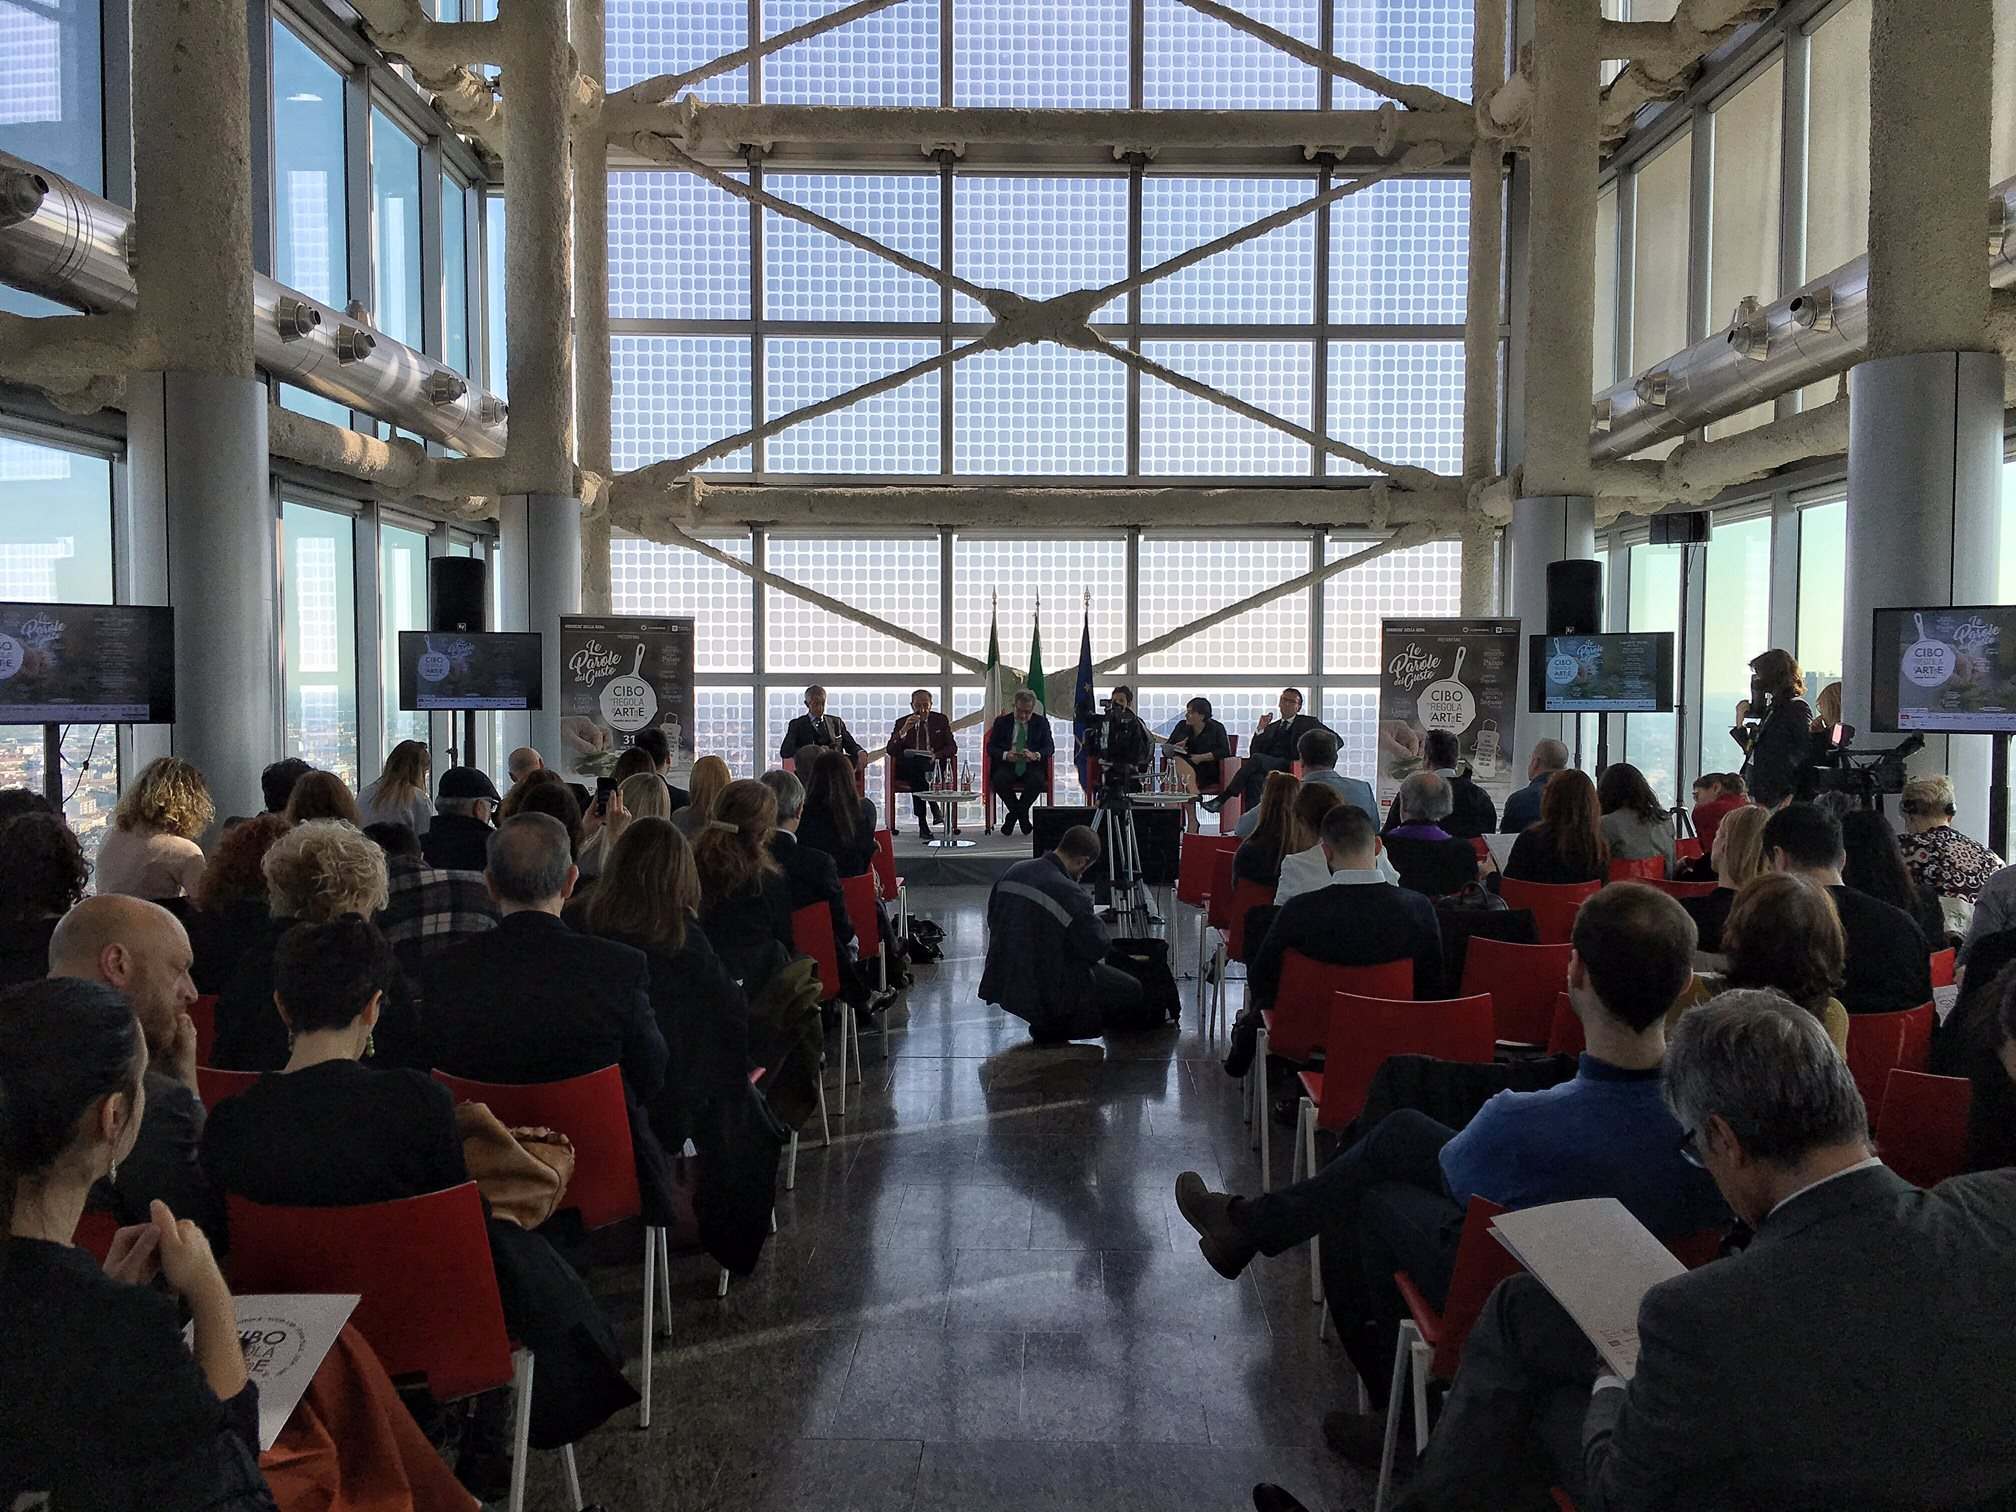 conferenza stampa - Cibo a regola d'arte